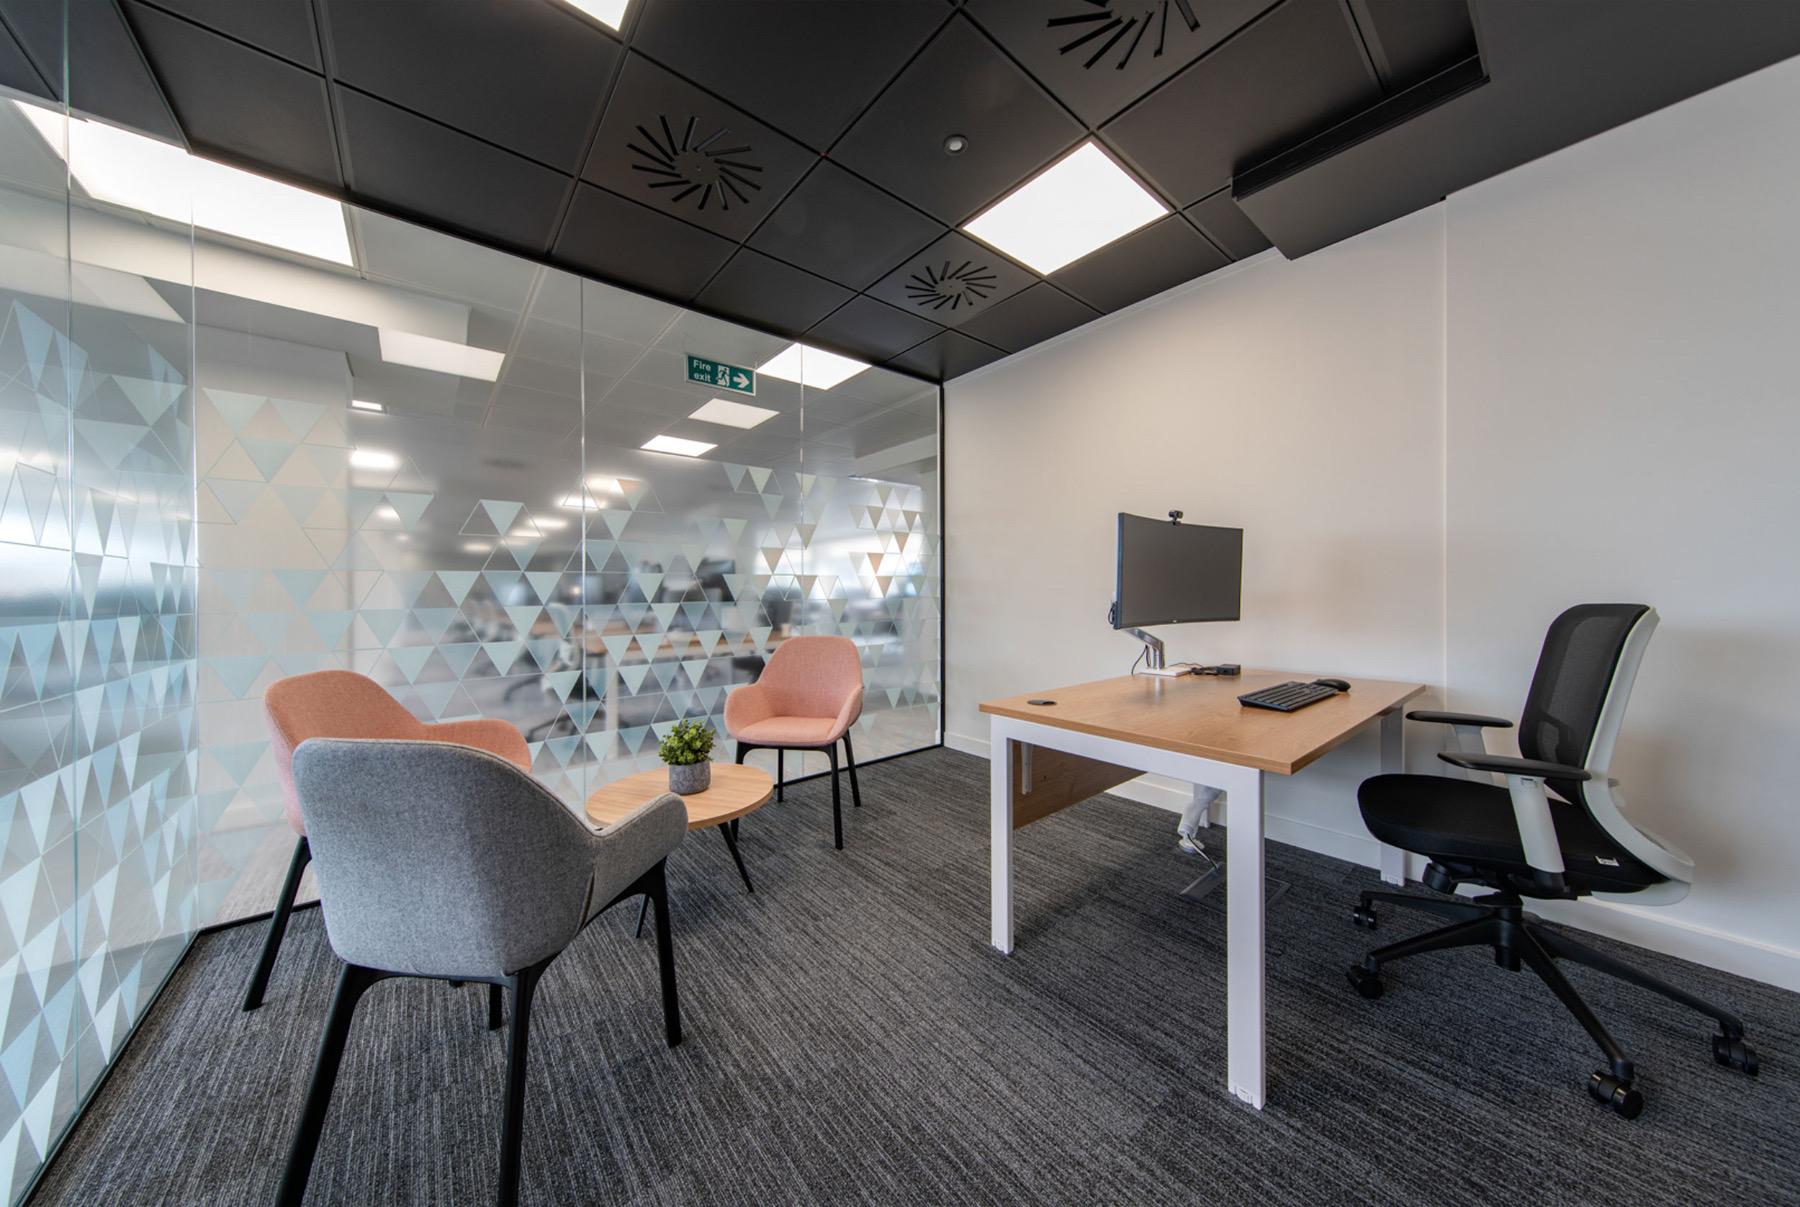 bridgepoint-credit-office-4